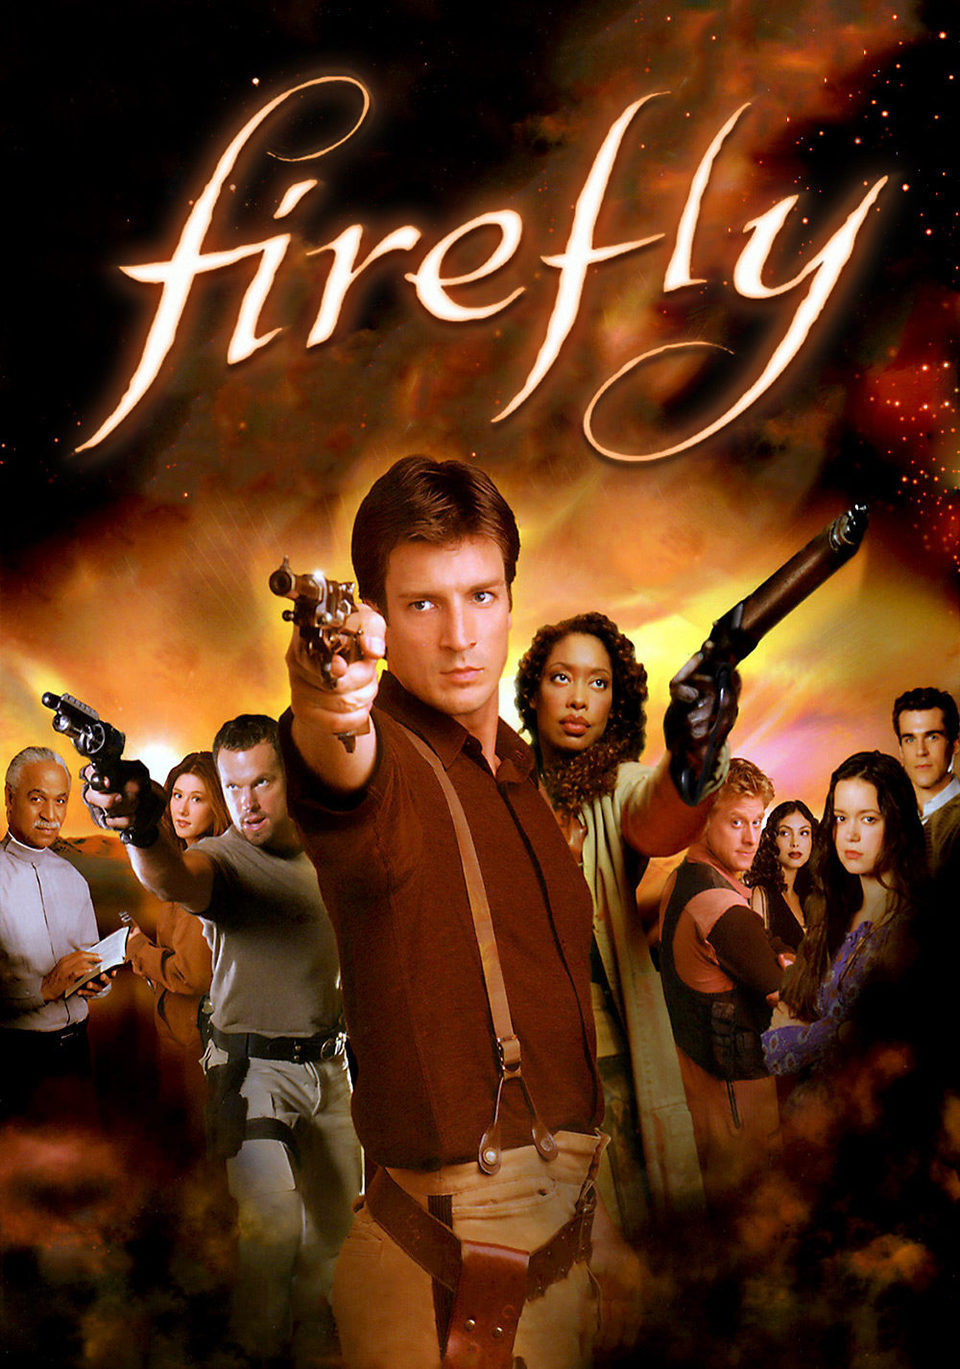 'Firefly' #2 poster for Firefly